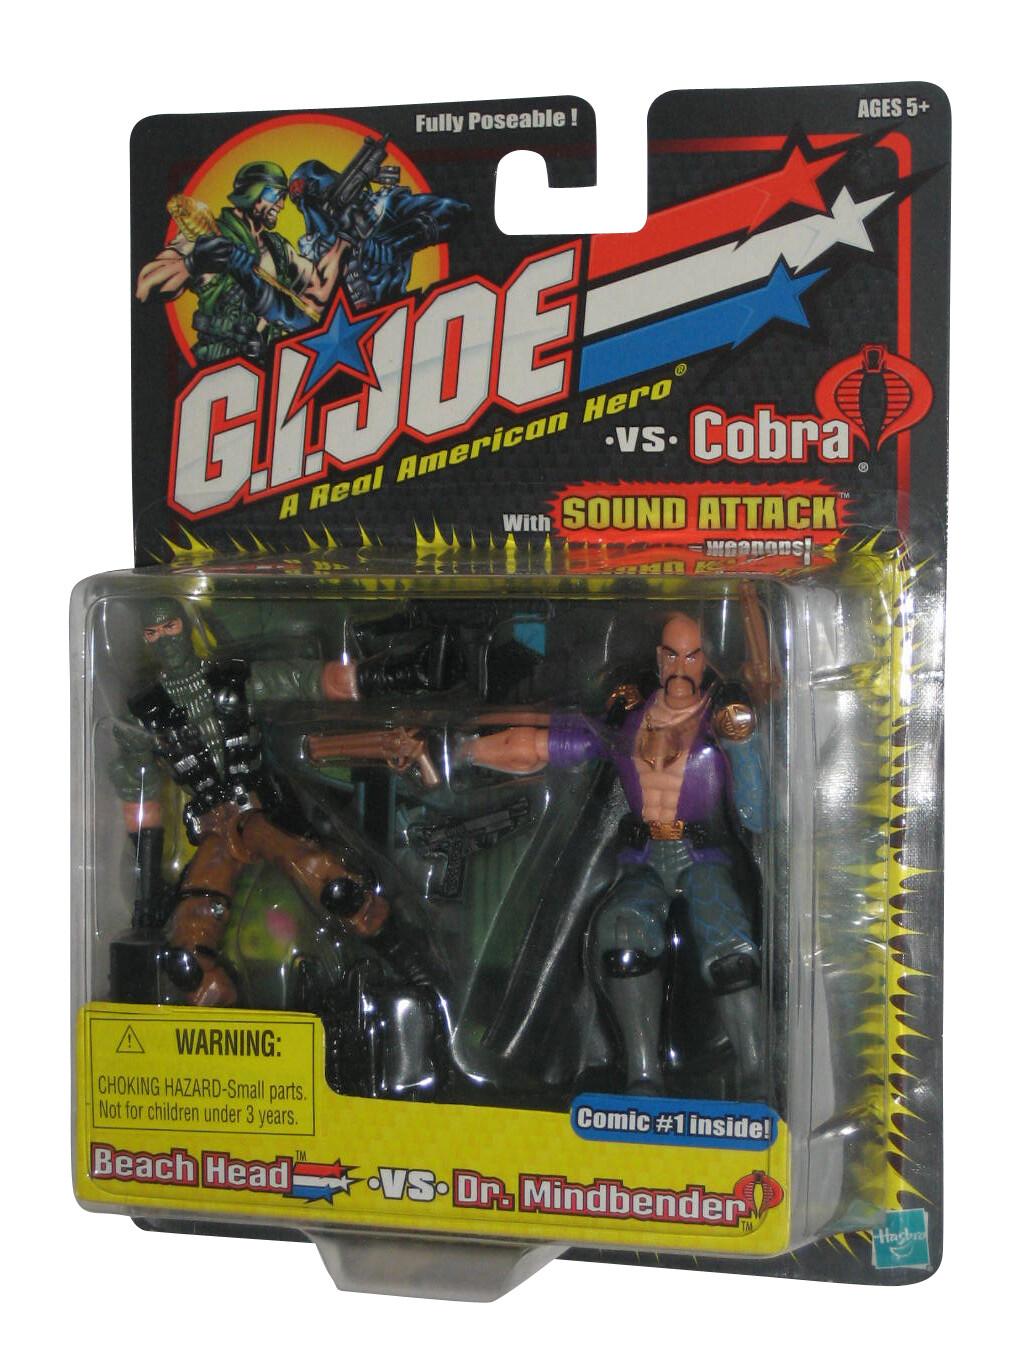 GI Joe vs Cobra: Beach Head vs Dr Mindbender